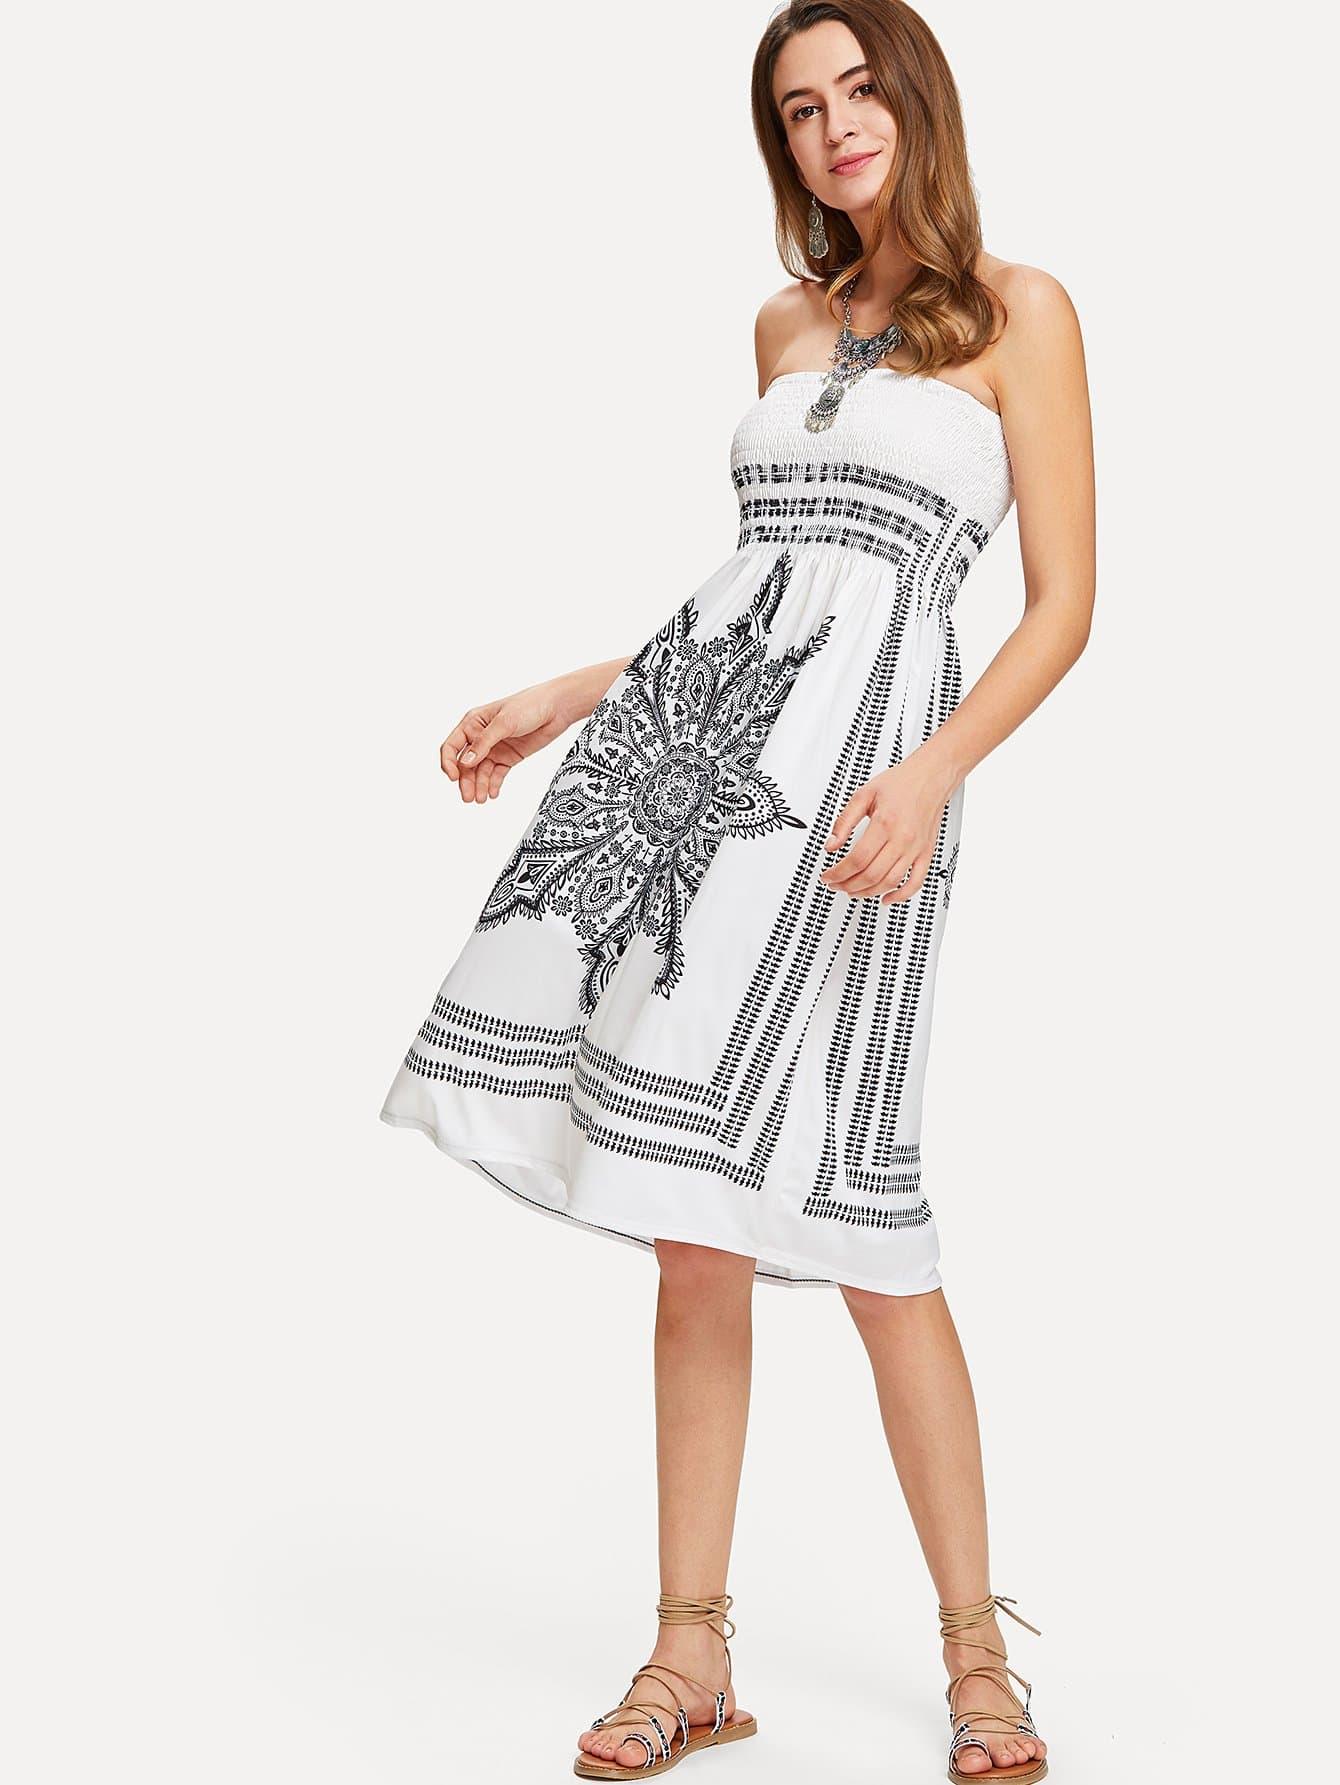 Shirred Bodice Tube Dress self tie shoulder shirred bodice geo dress